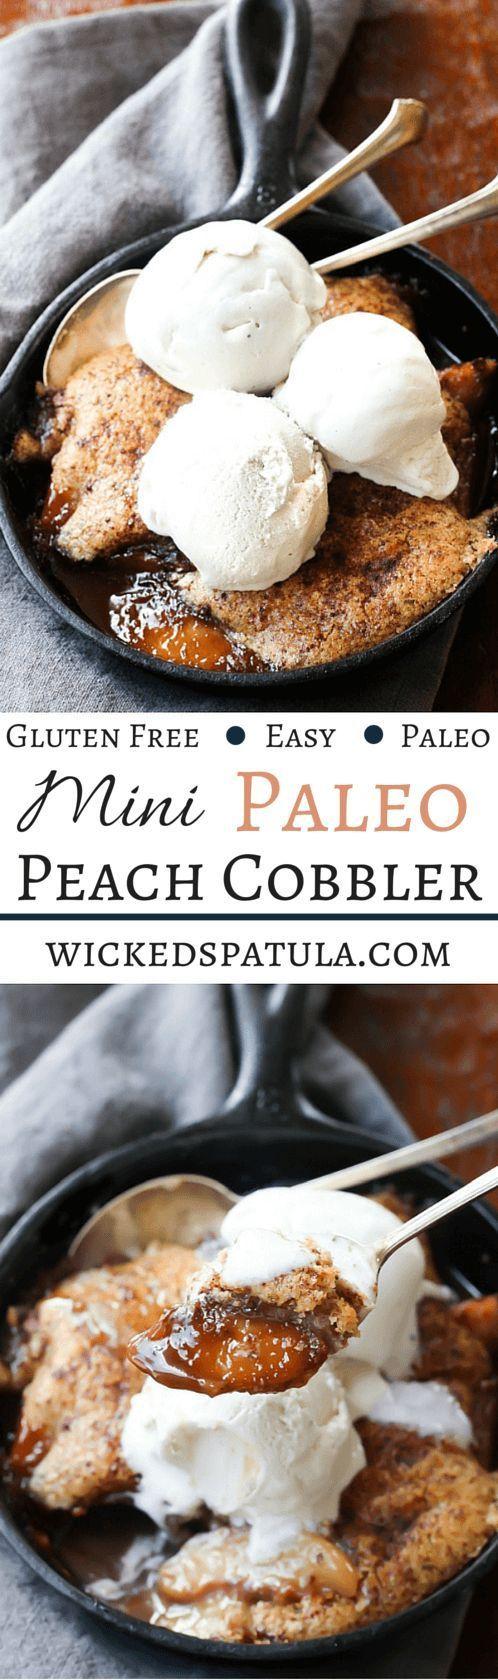 cobbler cobbler peach cobbler peach pancakes slightly perfect peach ...